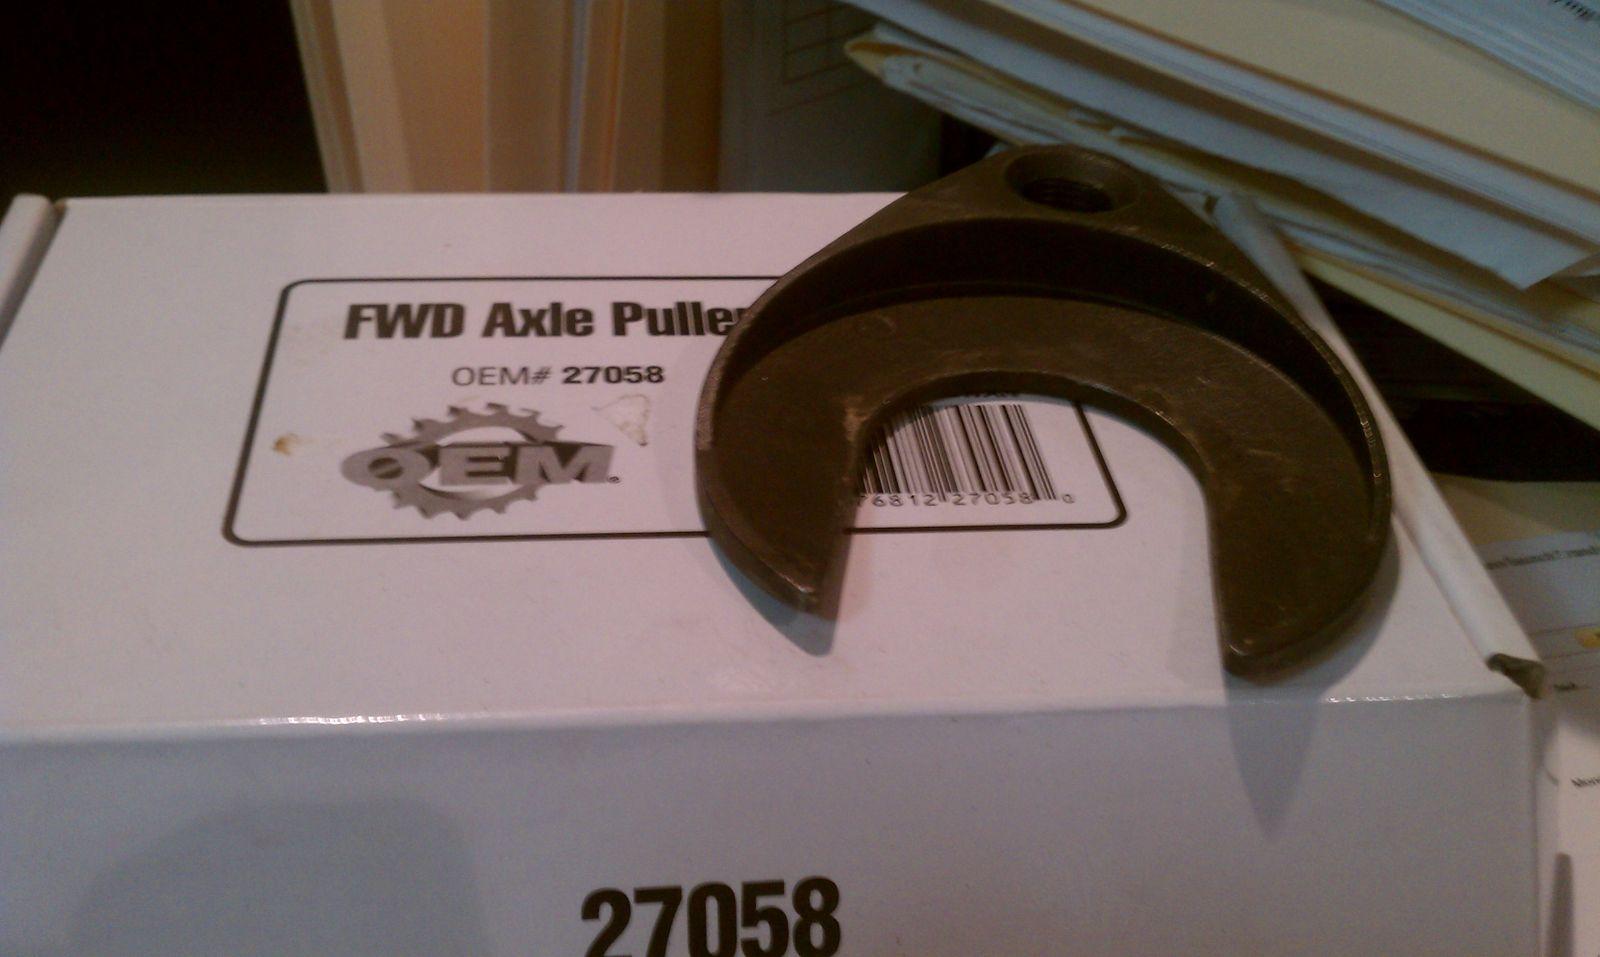 FWD Axle Puller - Autozone